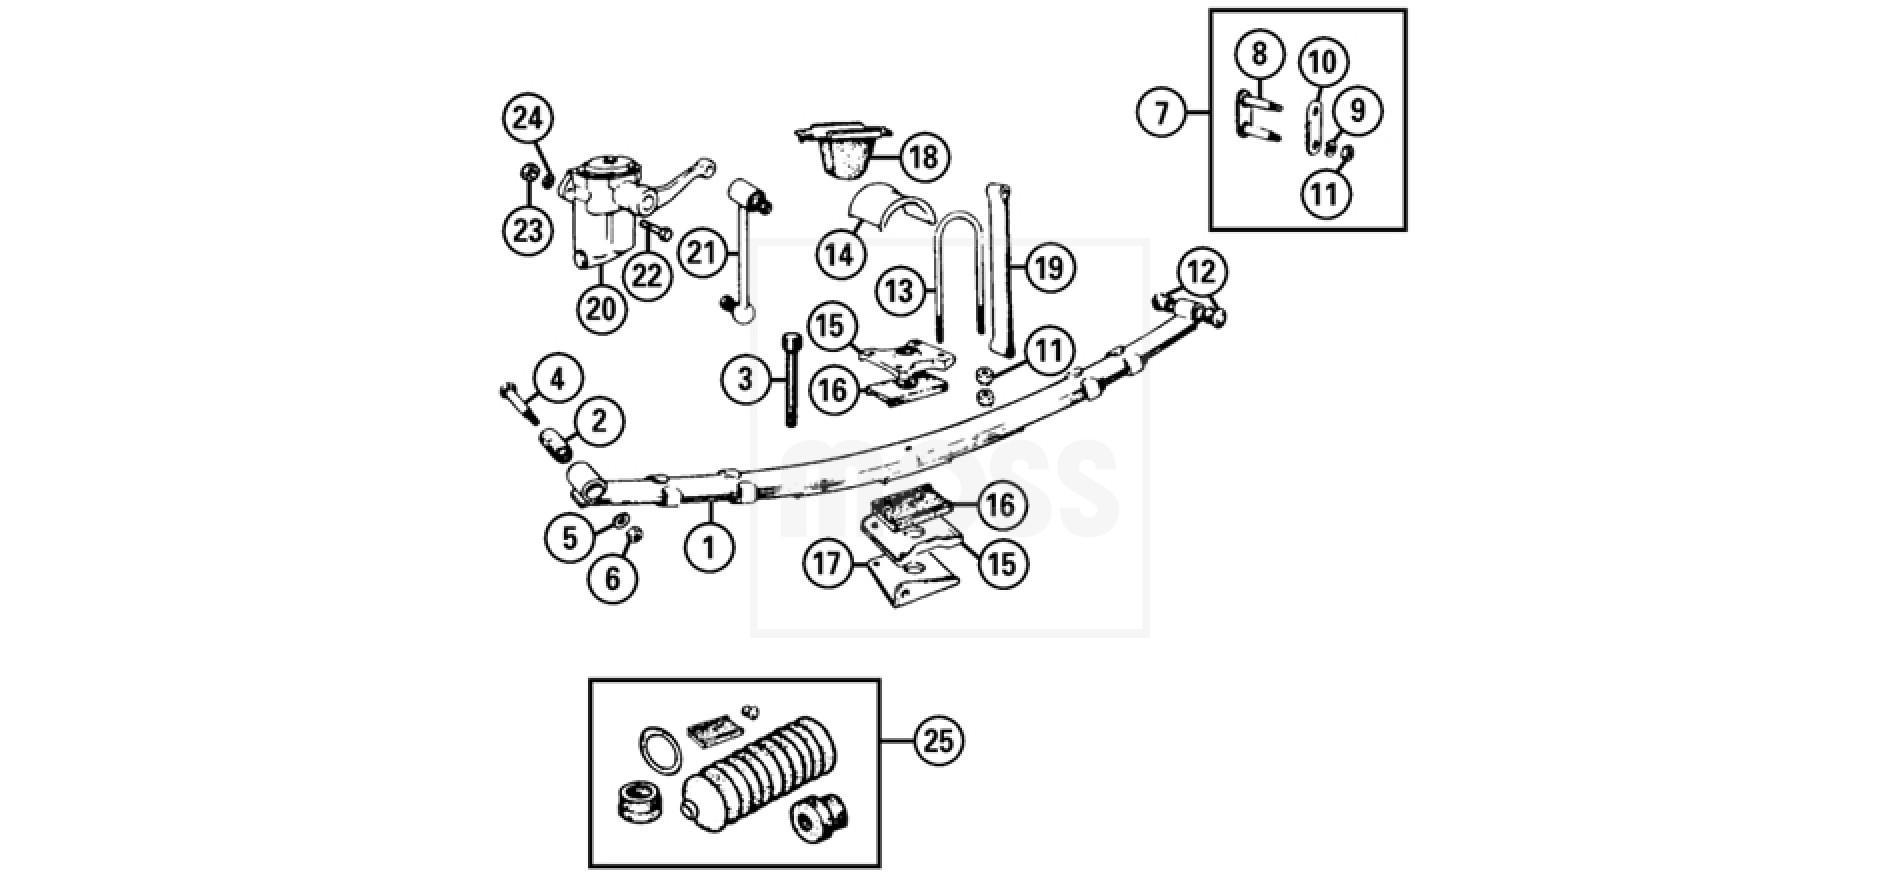 mg midget 1500 wiring diagram for harbor breeze ceiling fan light kit suspension fuse box